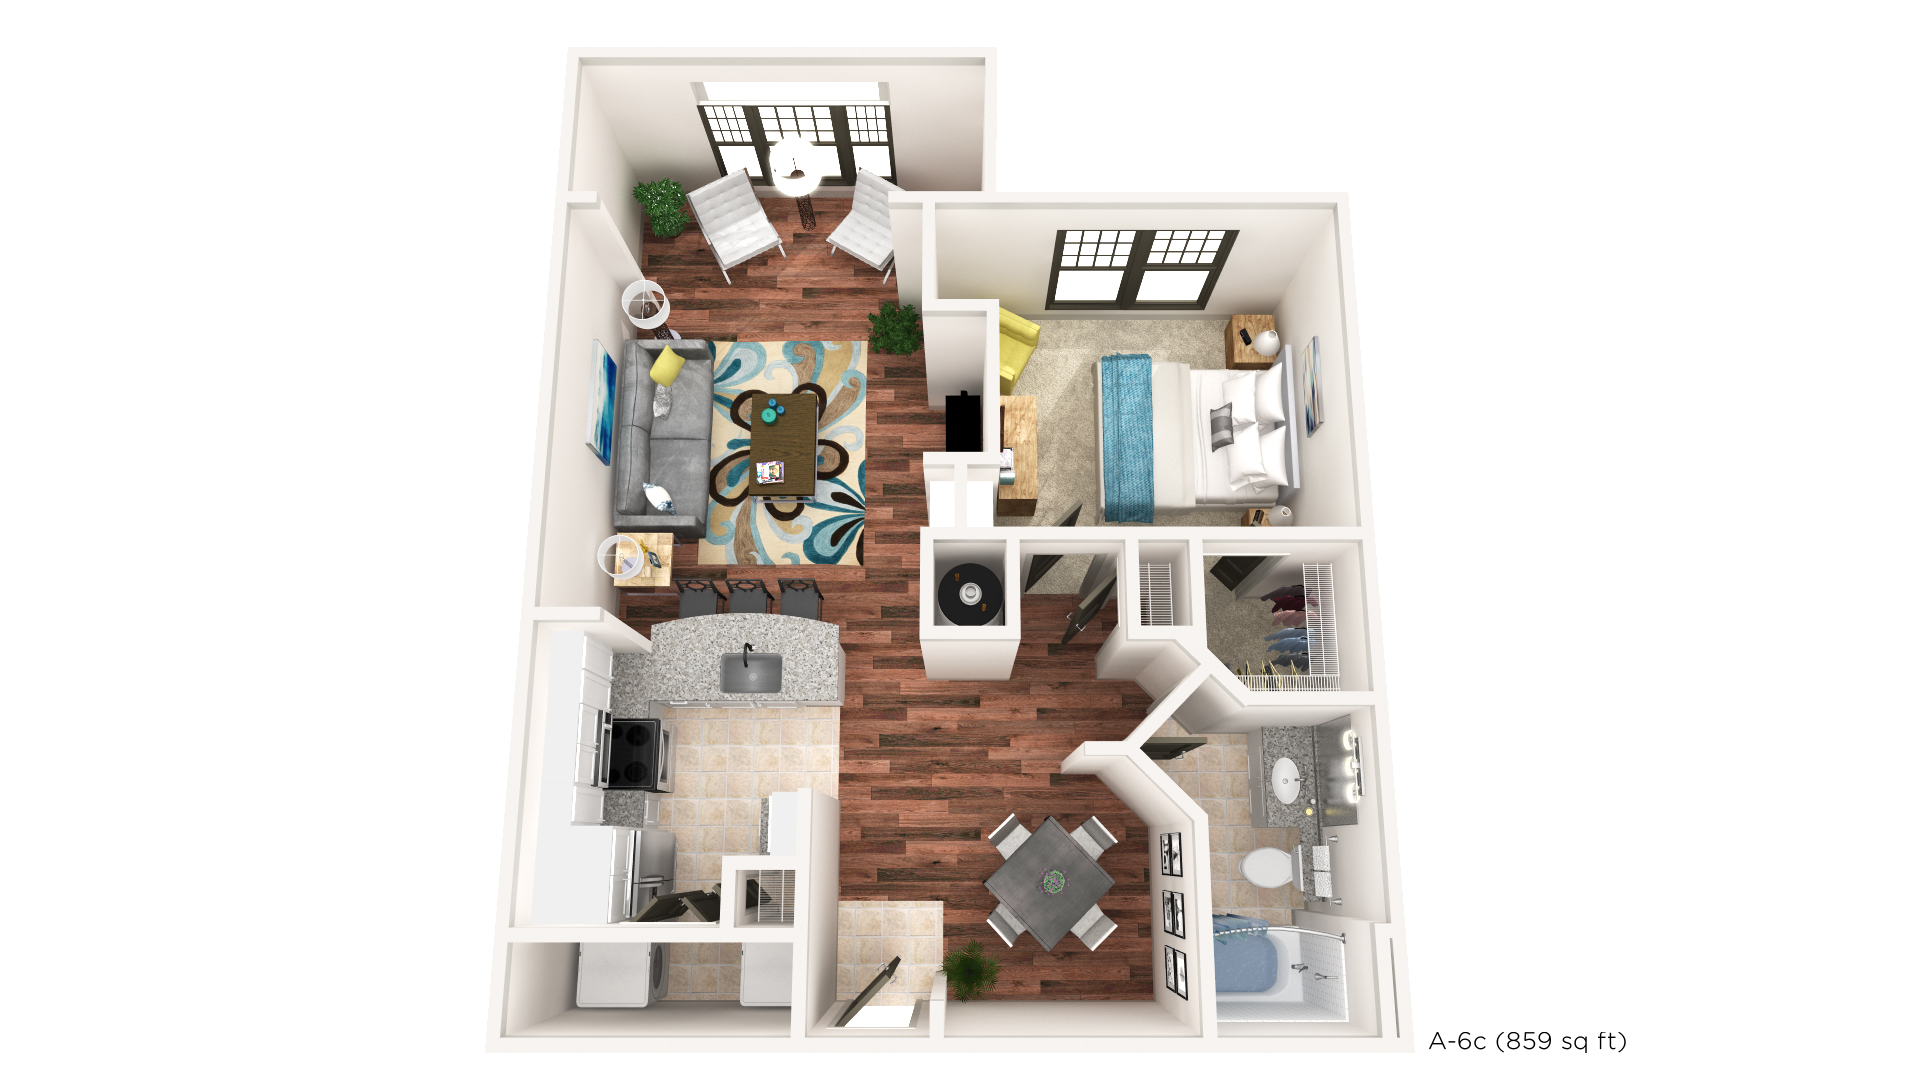 Brookleigh Flats Luxury Apartment Homes - Floorplan - A-6C